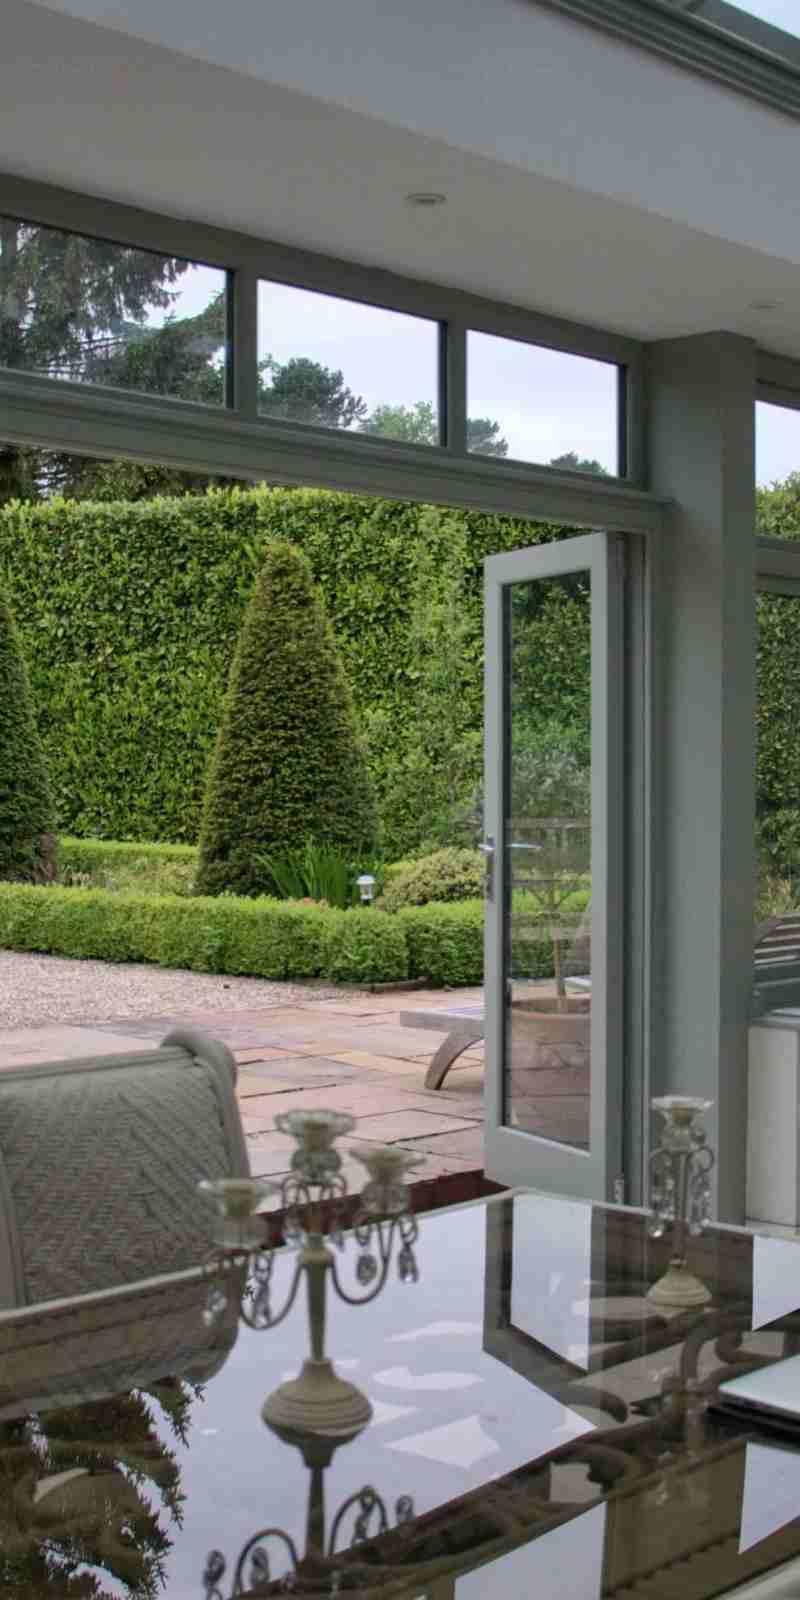 Accoya® chosen as the ideal wood for an Orangery in Birmingham